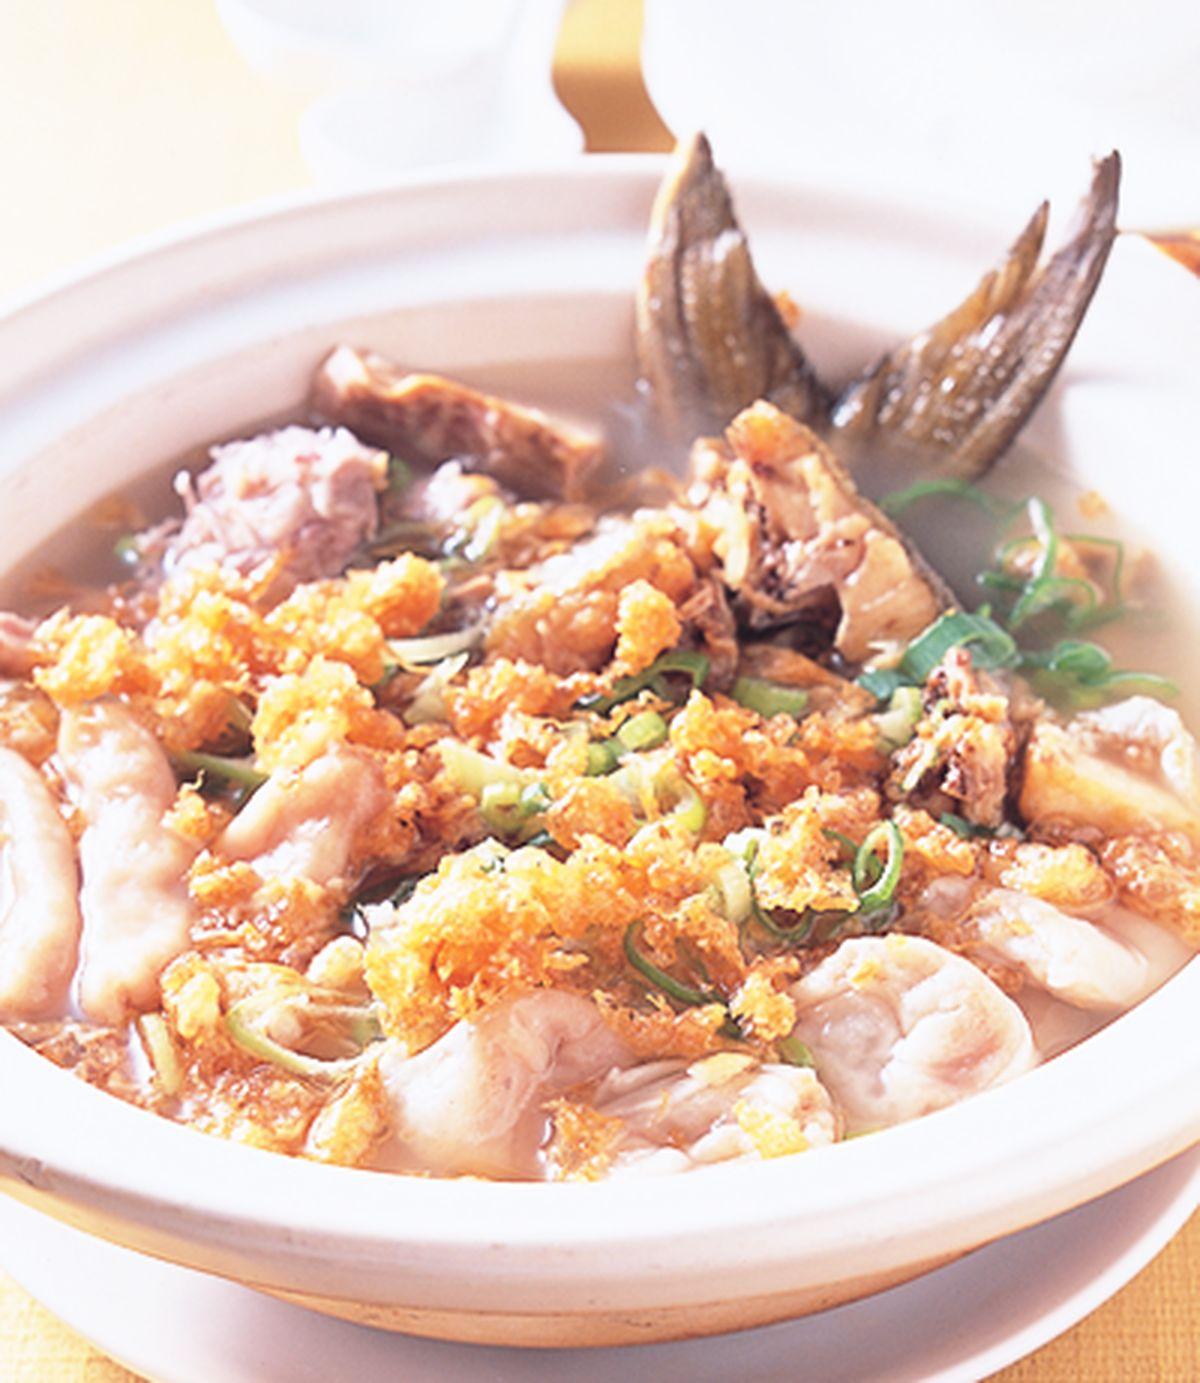 食譜:鮮首芋香鍋